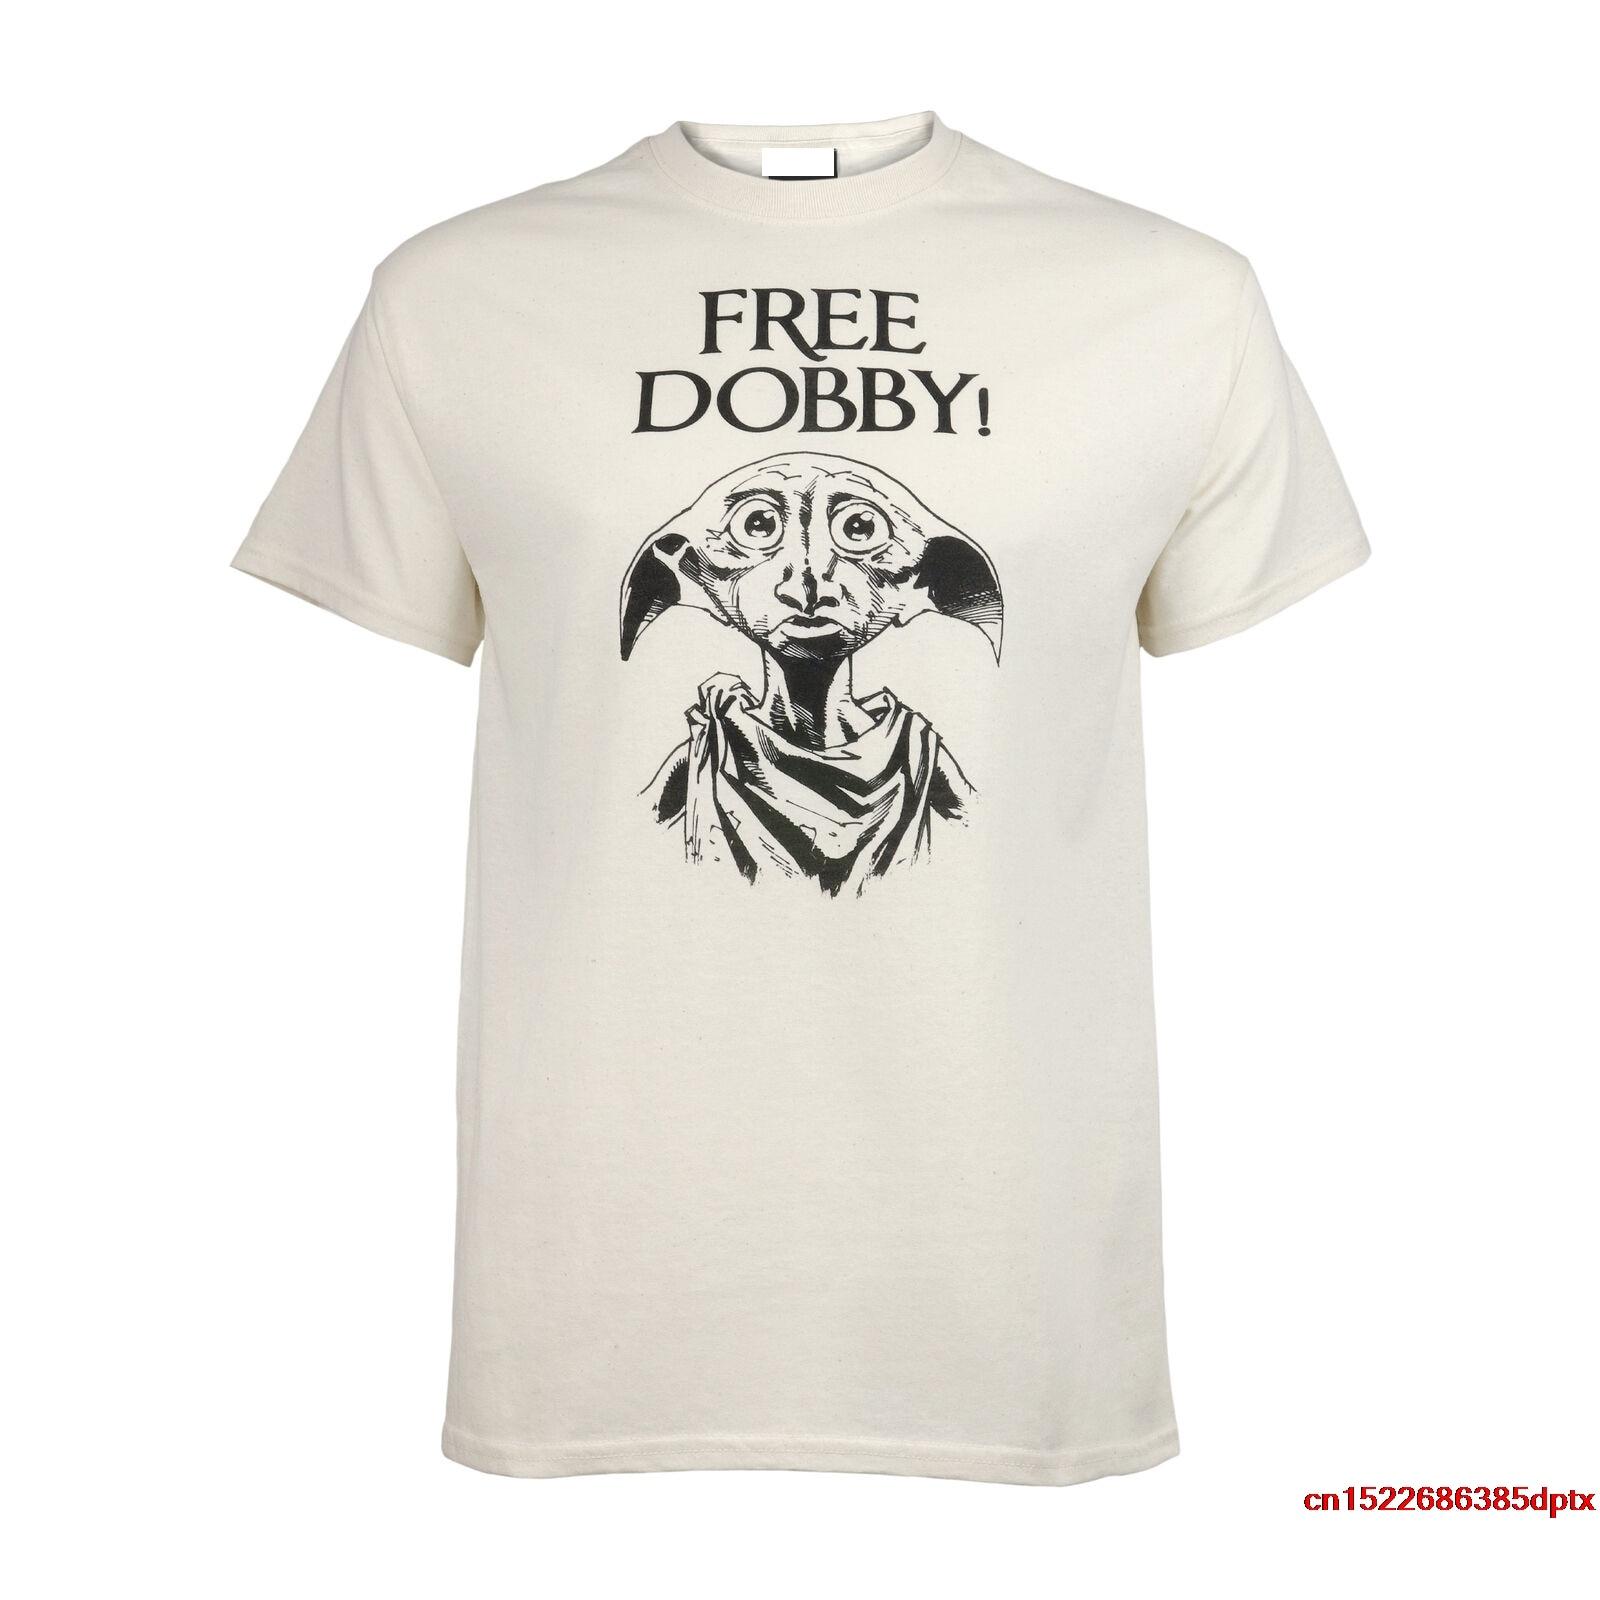 Free Dobby Men's Boyfriend Fit T-Shirt Merchandise Harry Man's T-shirt